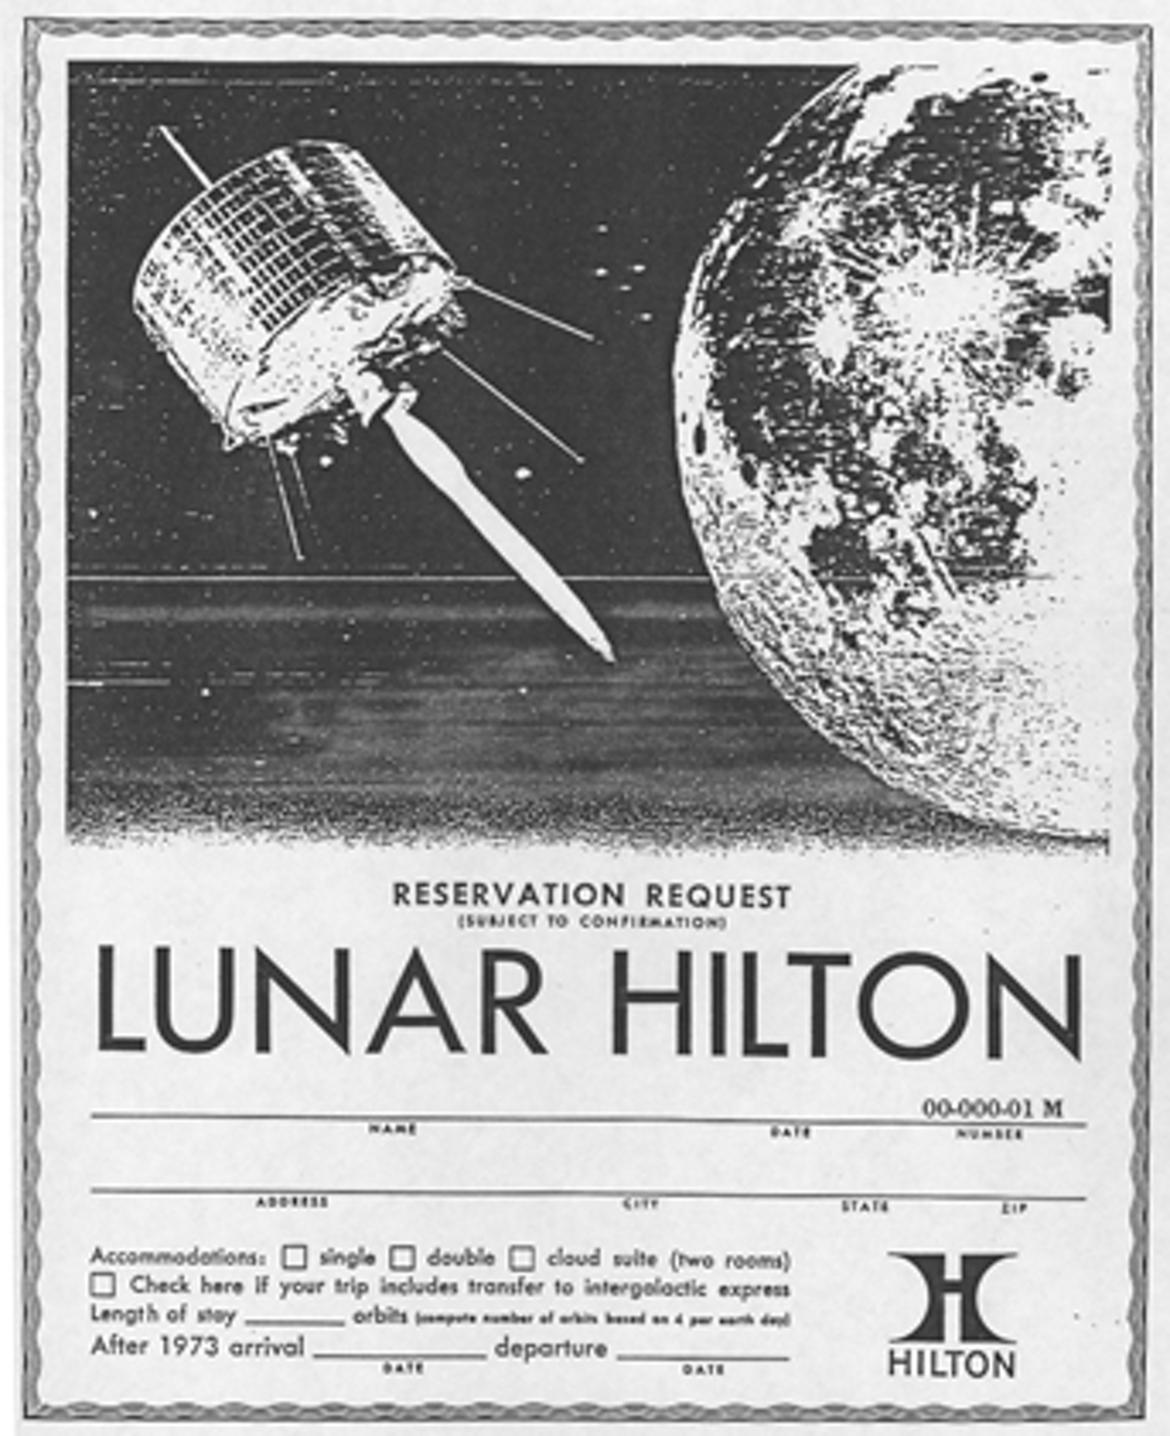 Moon Lunar Hilton